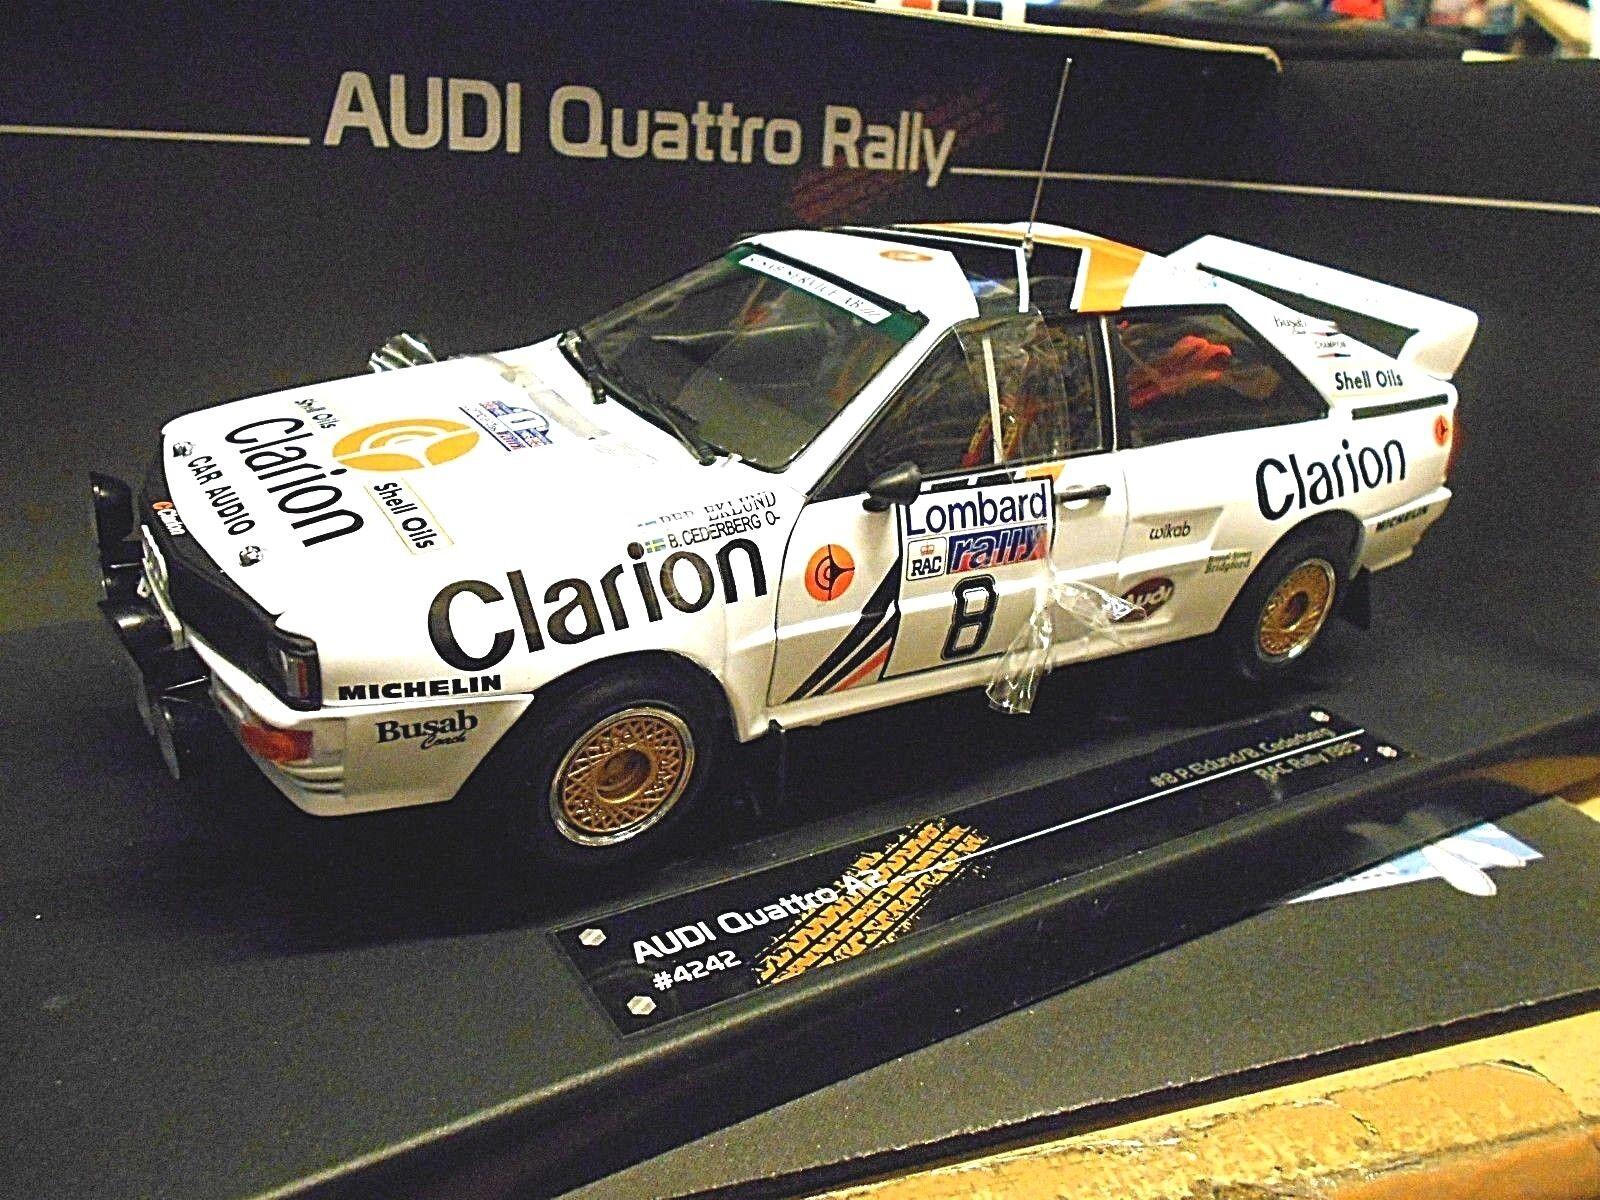 Audi Quattro Rallye WM gb RAC 1985 Eklund Clarion precio especial Sunstar 1 18